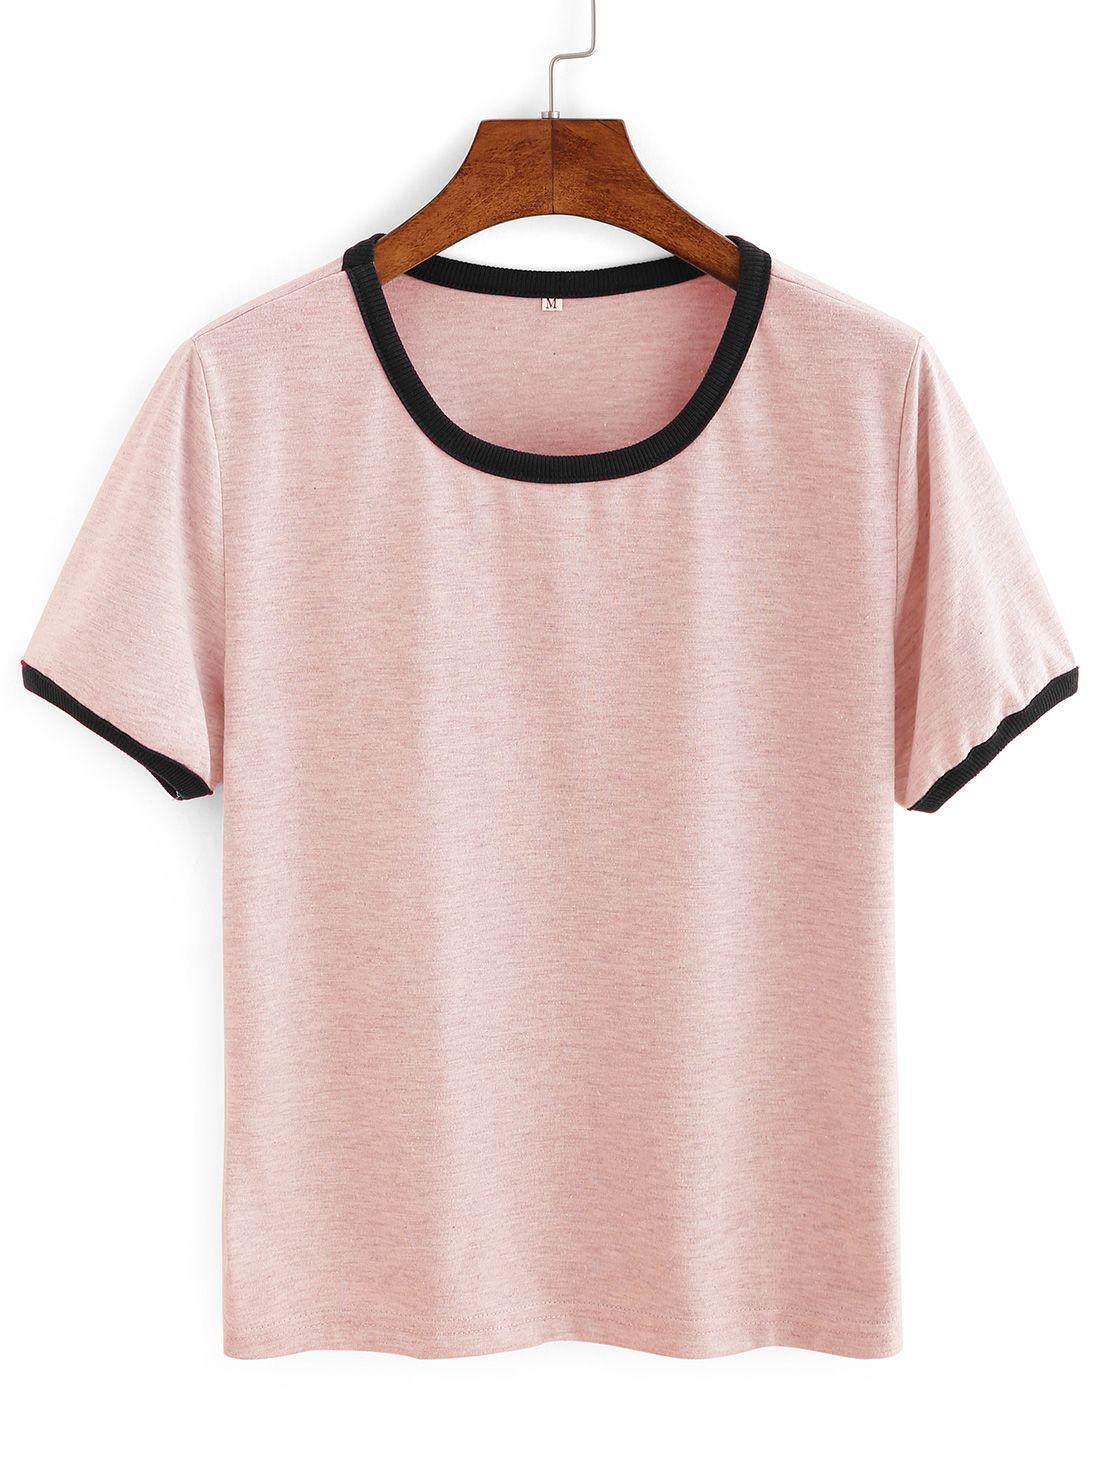 b211c7b02a7 #AdoreWe #ROMWE T-shirts - Designer ROMWE Pink Contrast Round Neck T-shirt  - AdoreWe.com